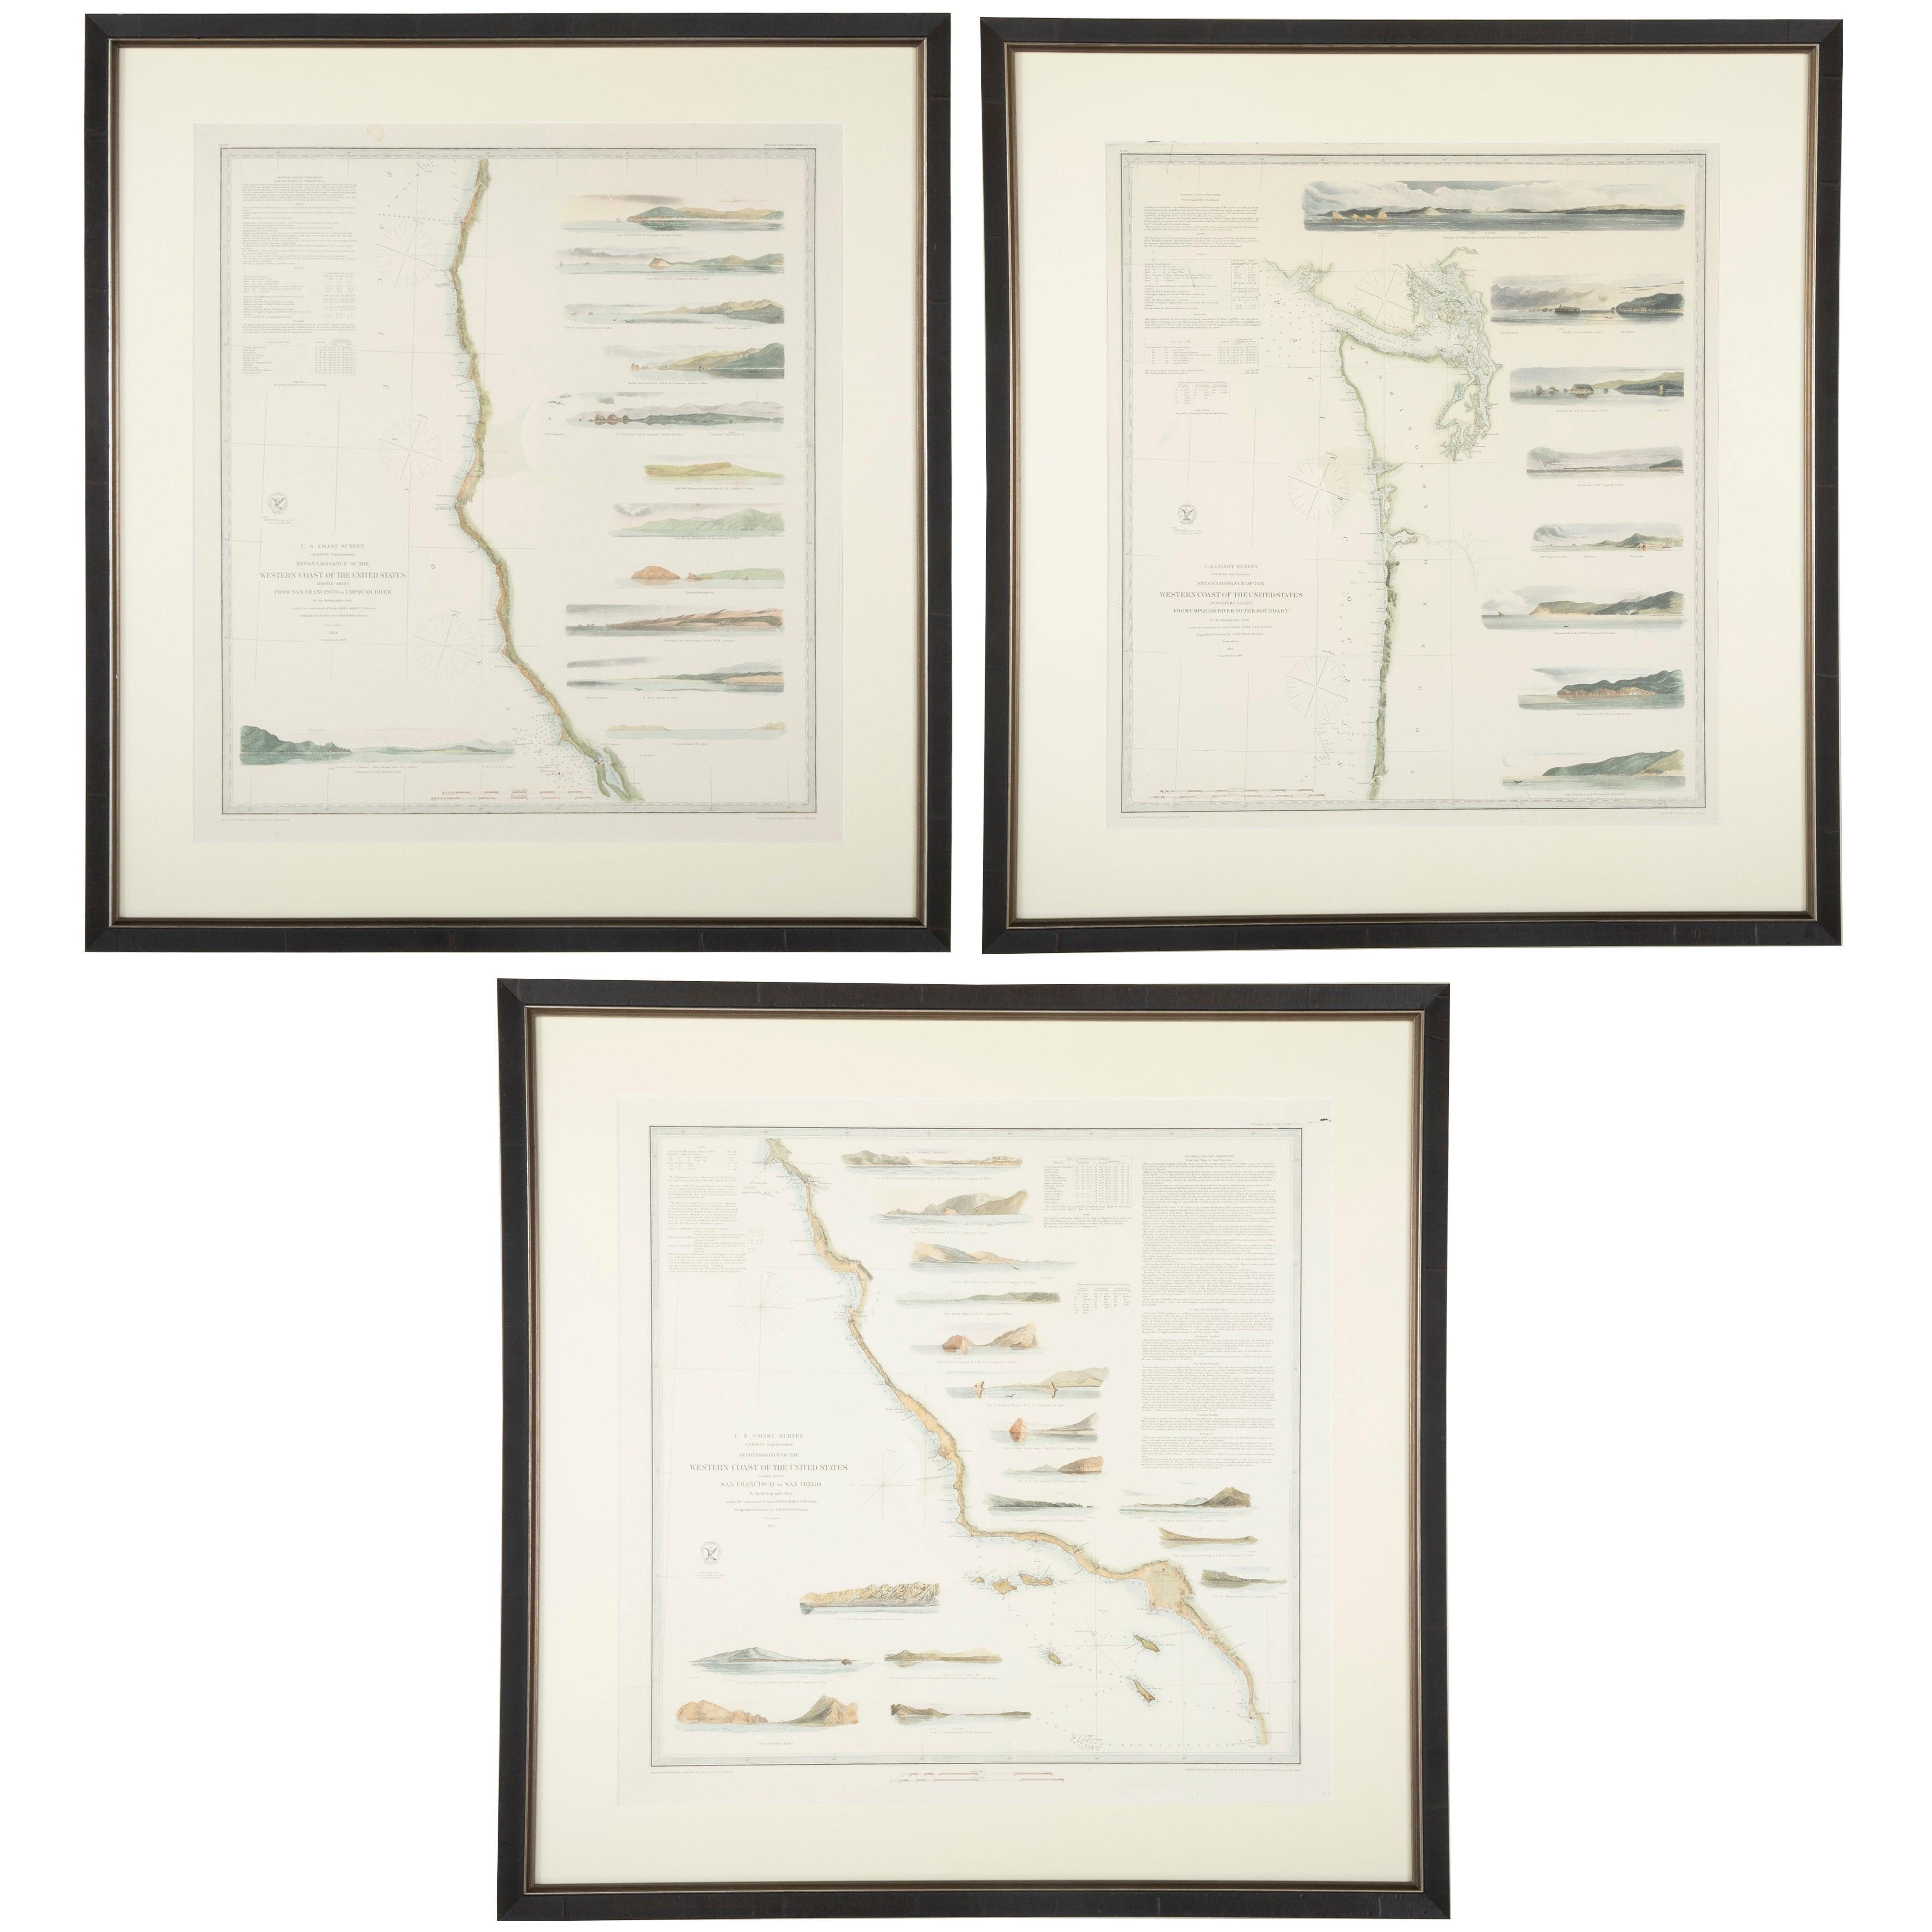 Mid-19th Century Set of Three Charts of the West Coast